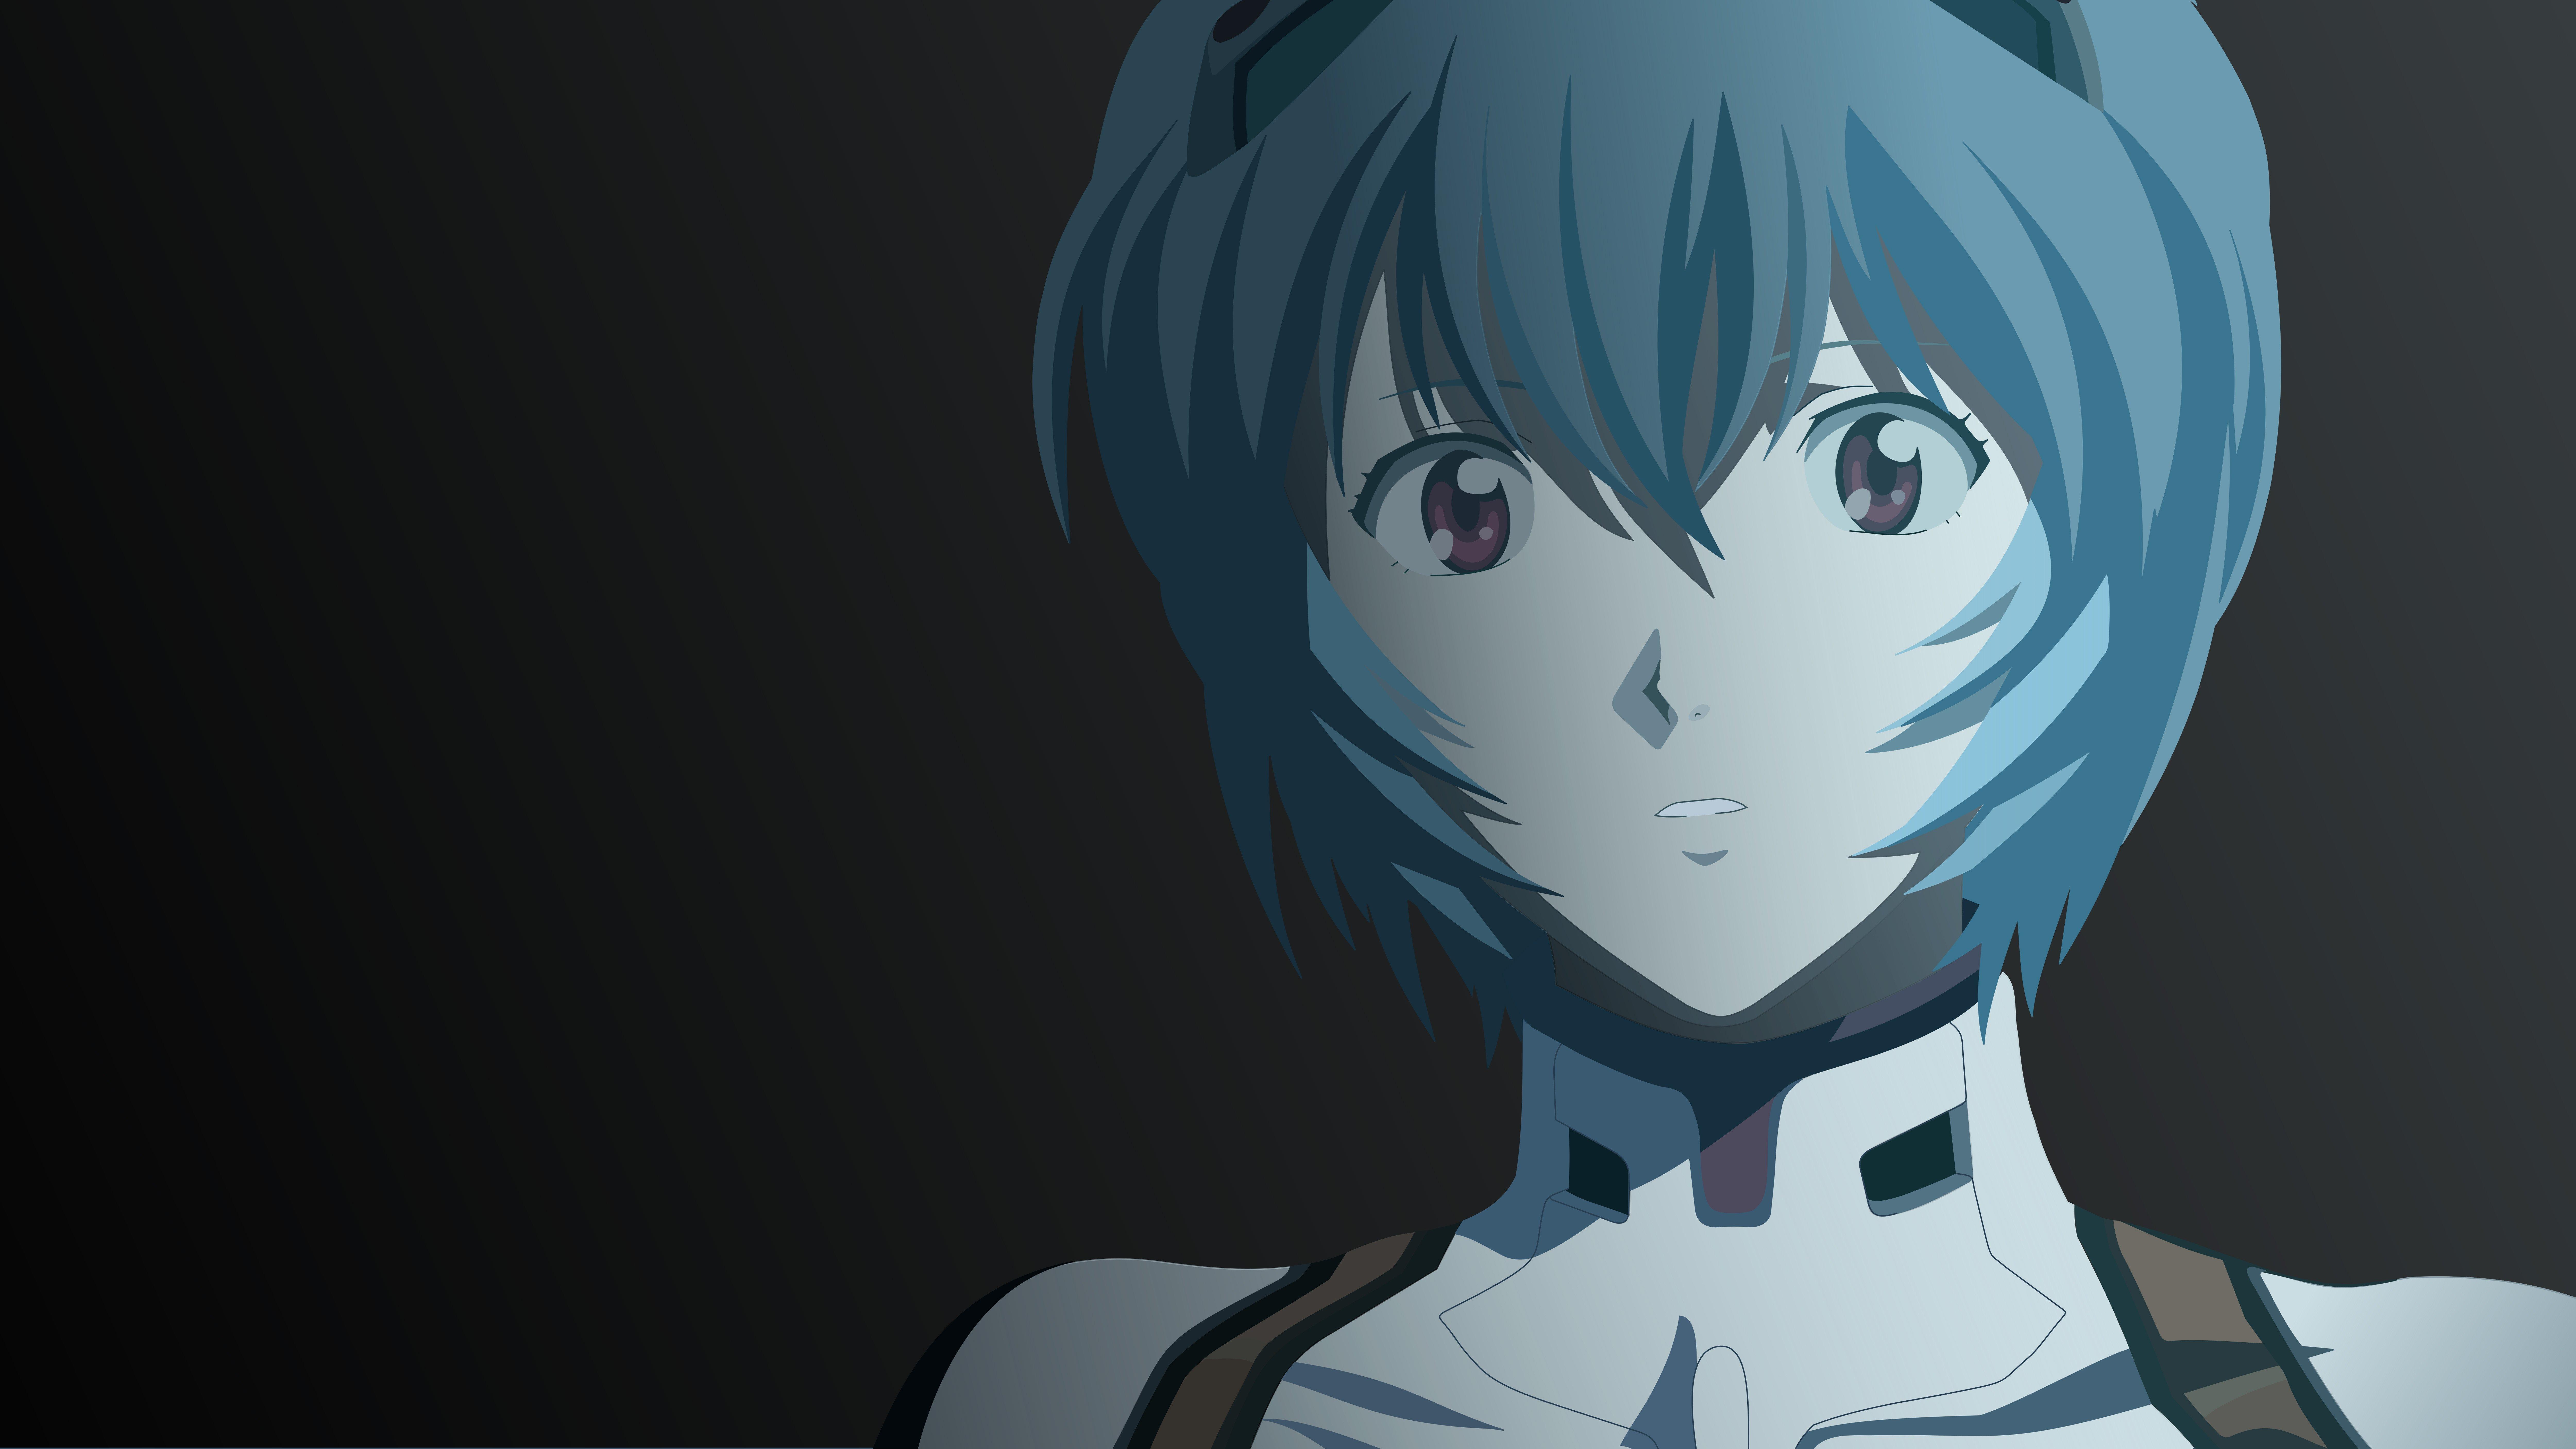 Fondos de pantalla Anime Rei Ayanami de Neon Genesis Evangelion